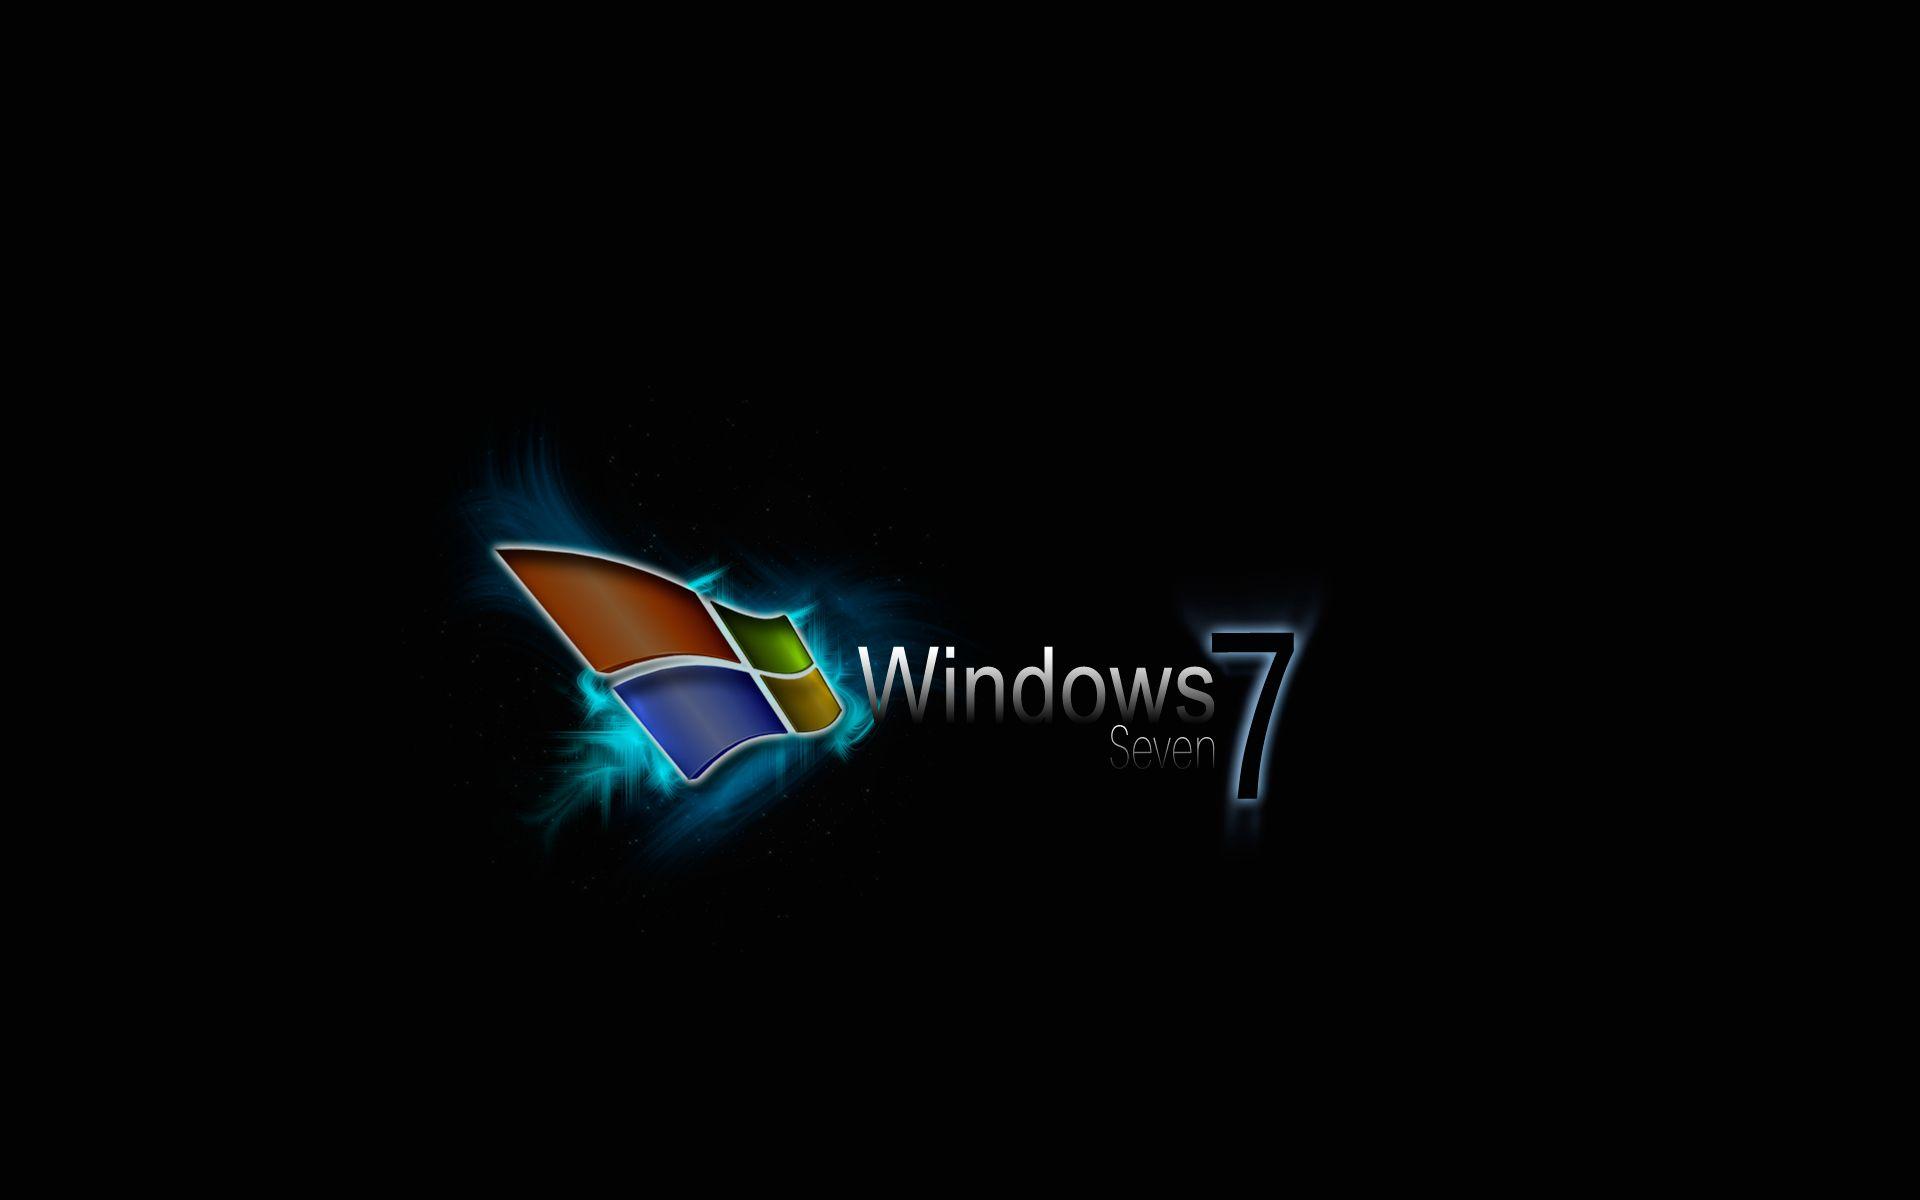 Windows 7 Hd Wallpapers Wallpaper Windows 10 Desktop Wallpaper Black Windows Wallpaper